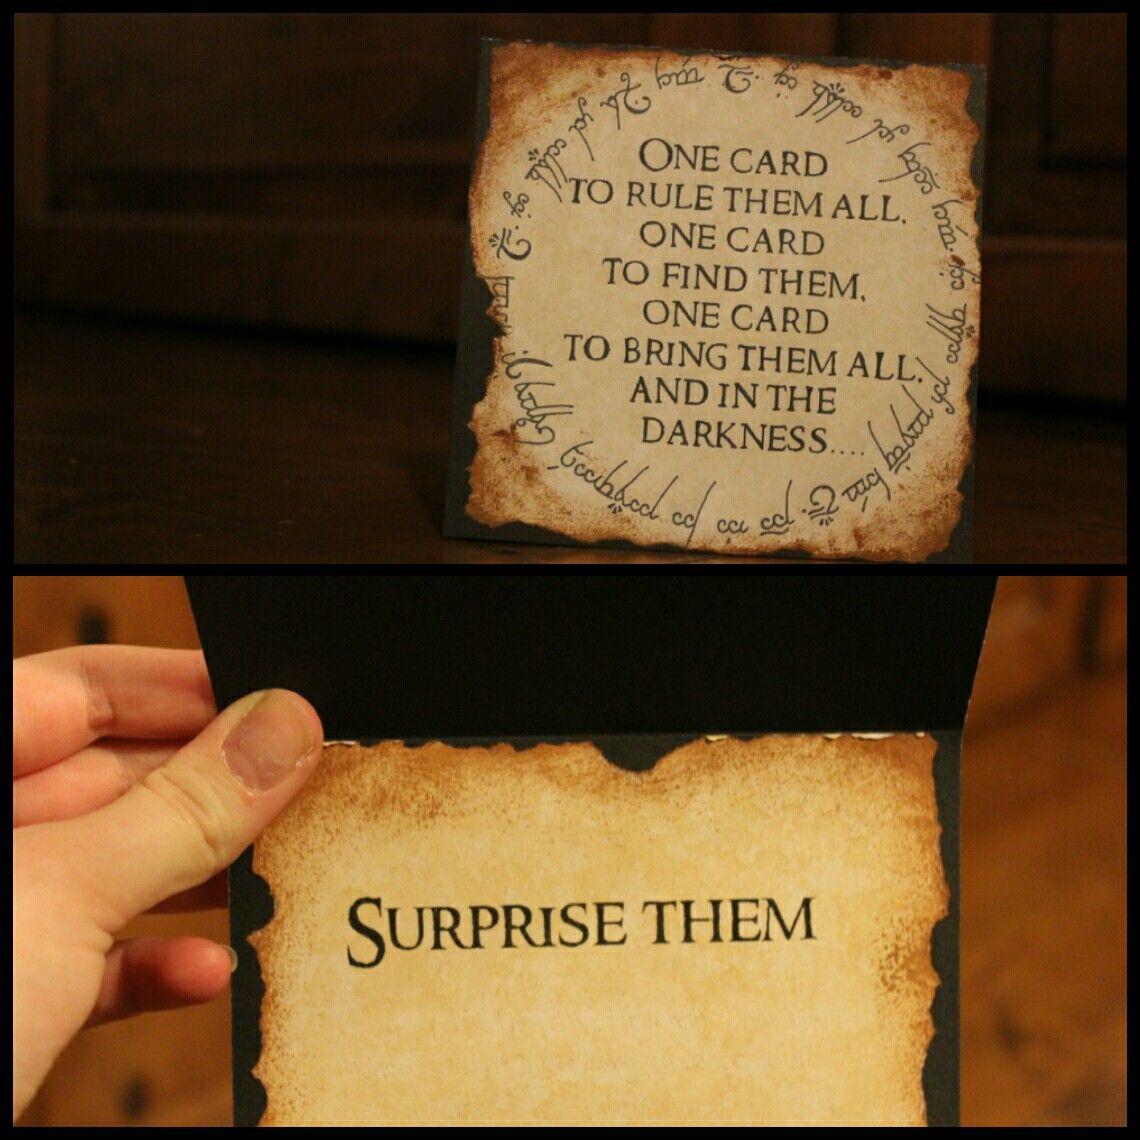 Lord Of The Rings Birthday Card The One Card To Rule Them All Geburtstagskarte Karten Geschenke